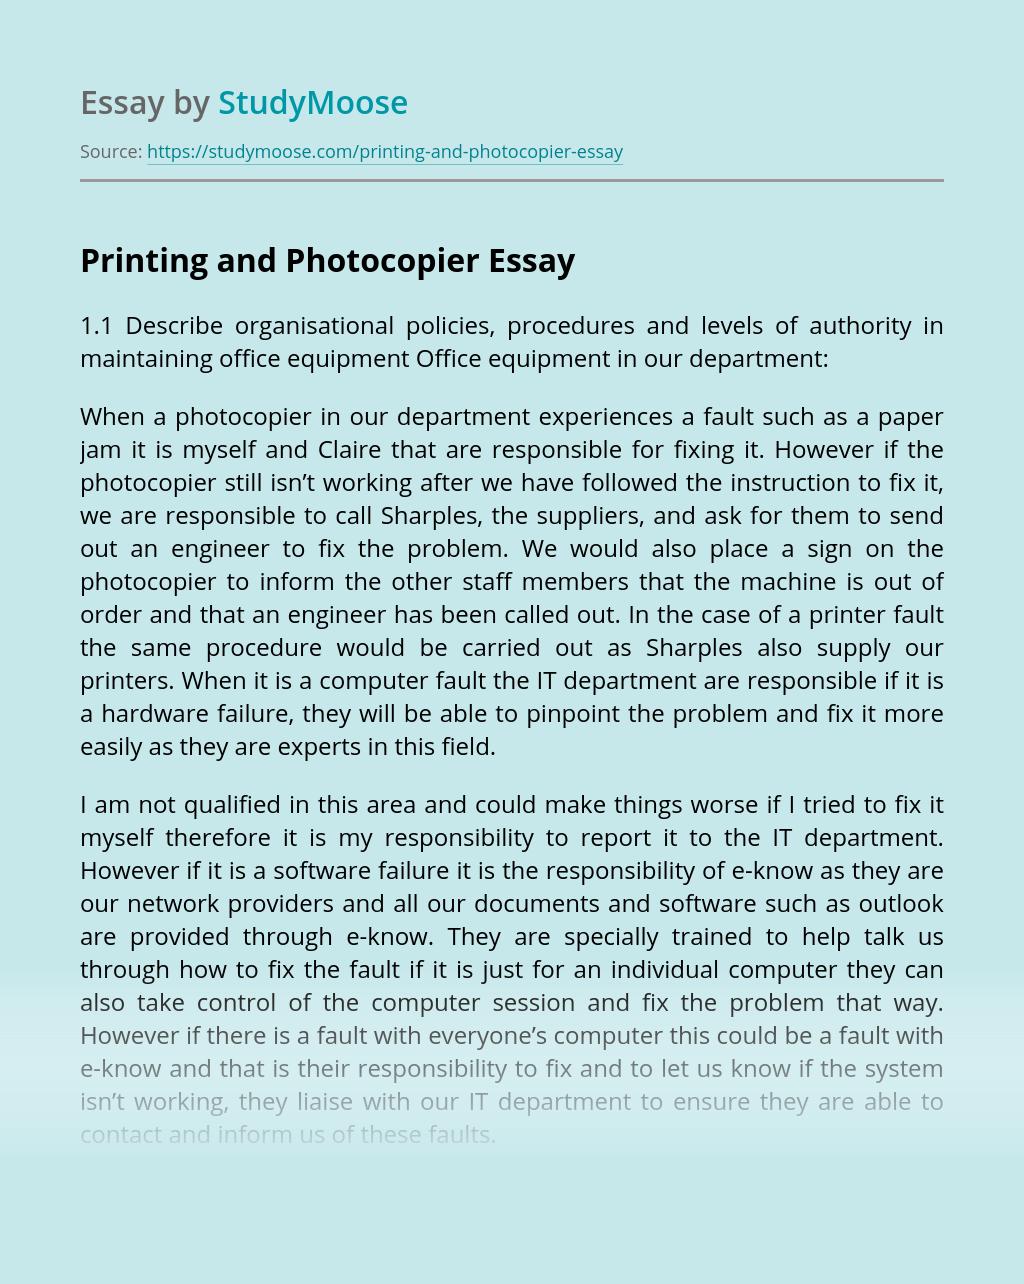 Printing and Photocopier